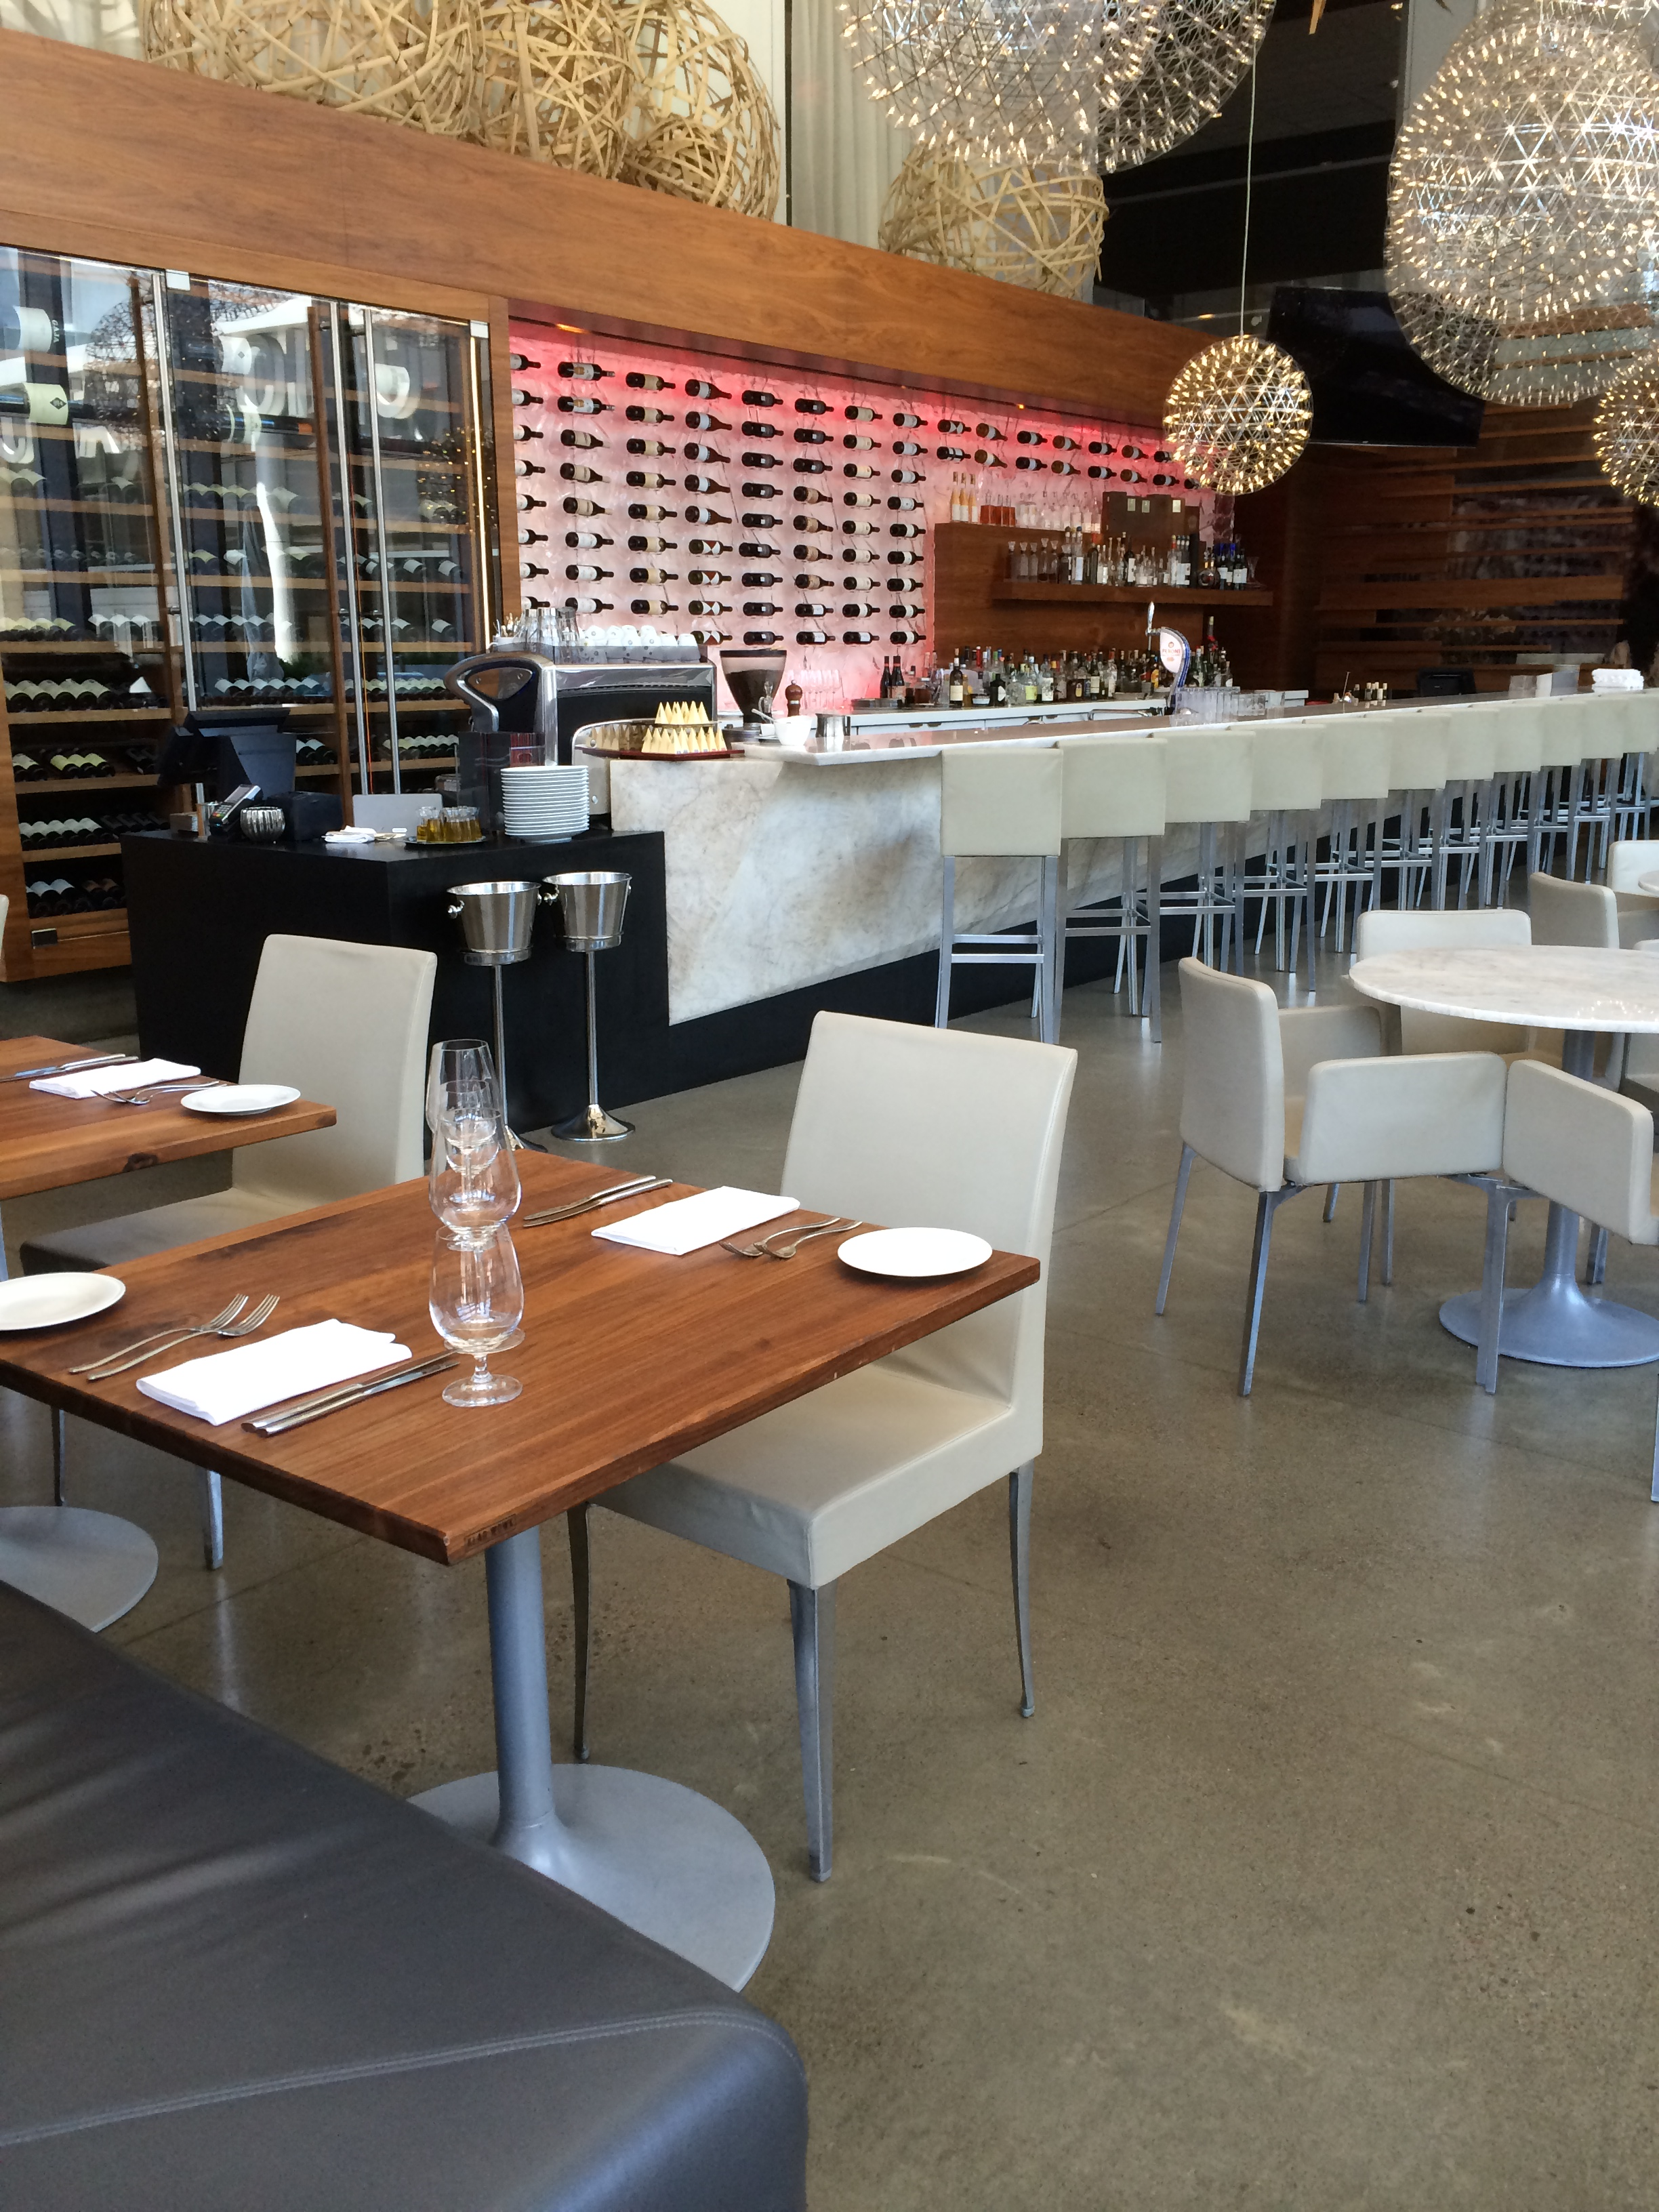 Picture of accessible interior of restaurant. Level flooring, white furniture